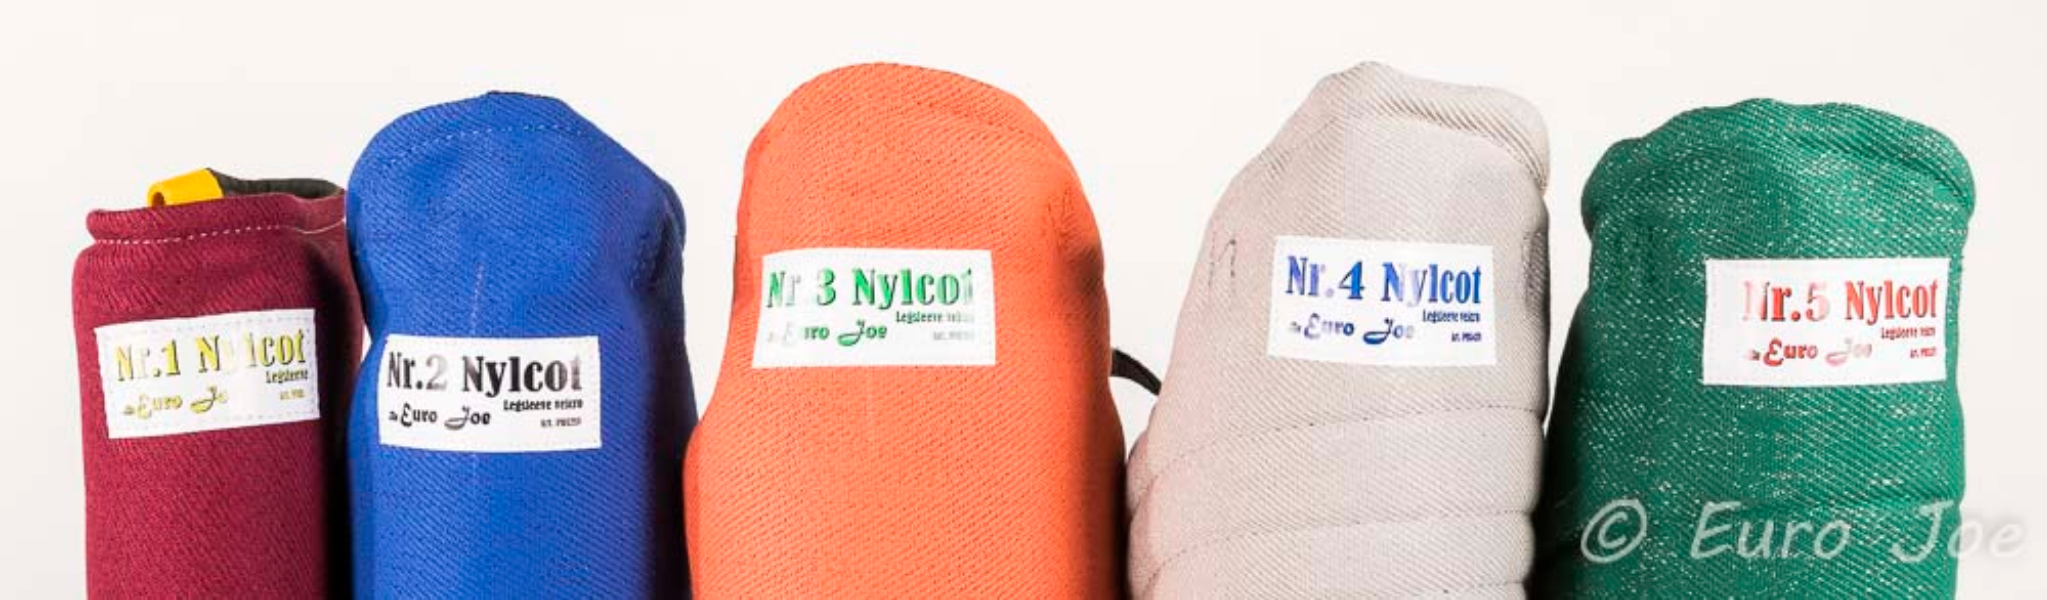 Euro-Joe-Bite-Sleeve-Leg-High-Velcro-Nylcot-Full-Set